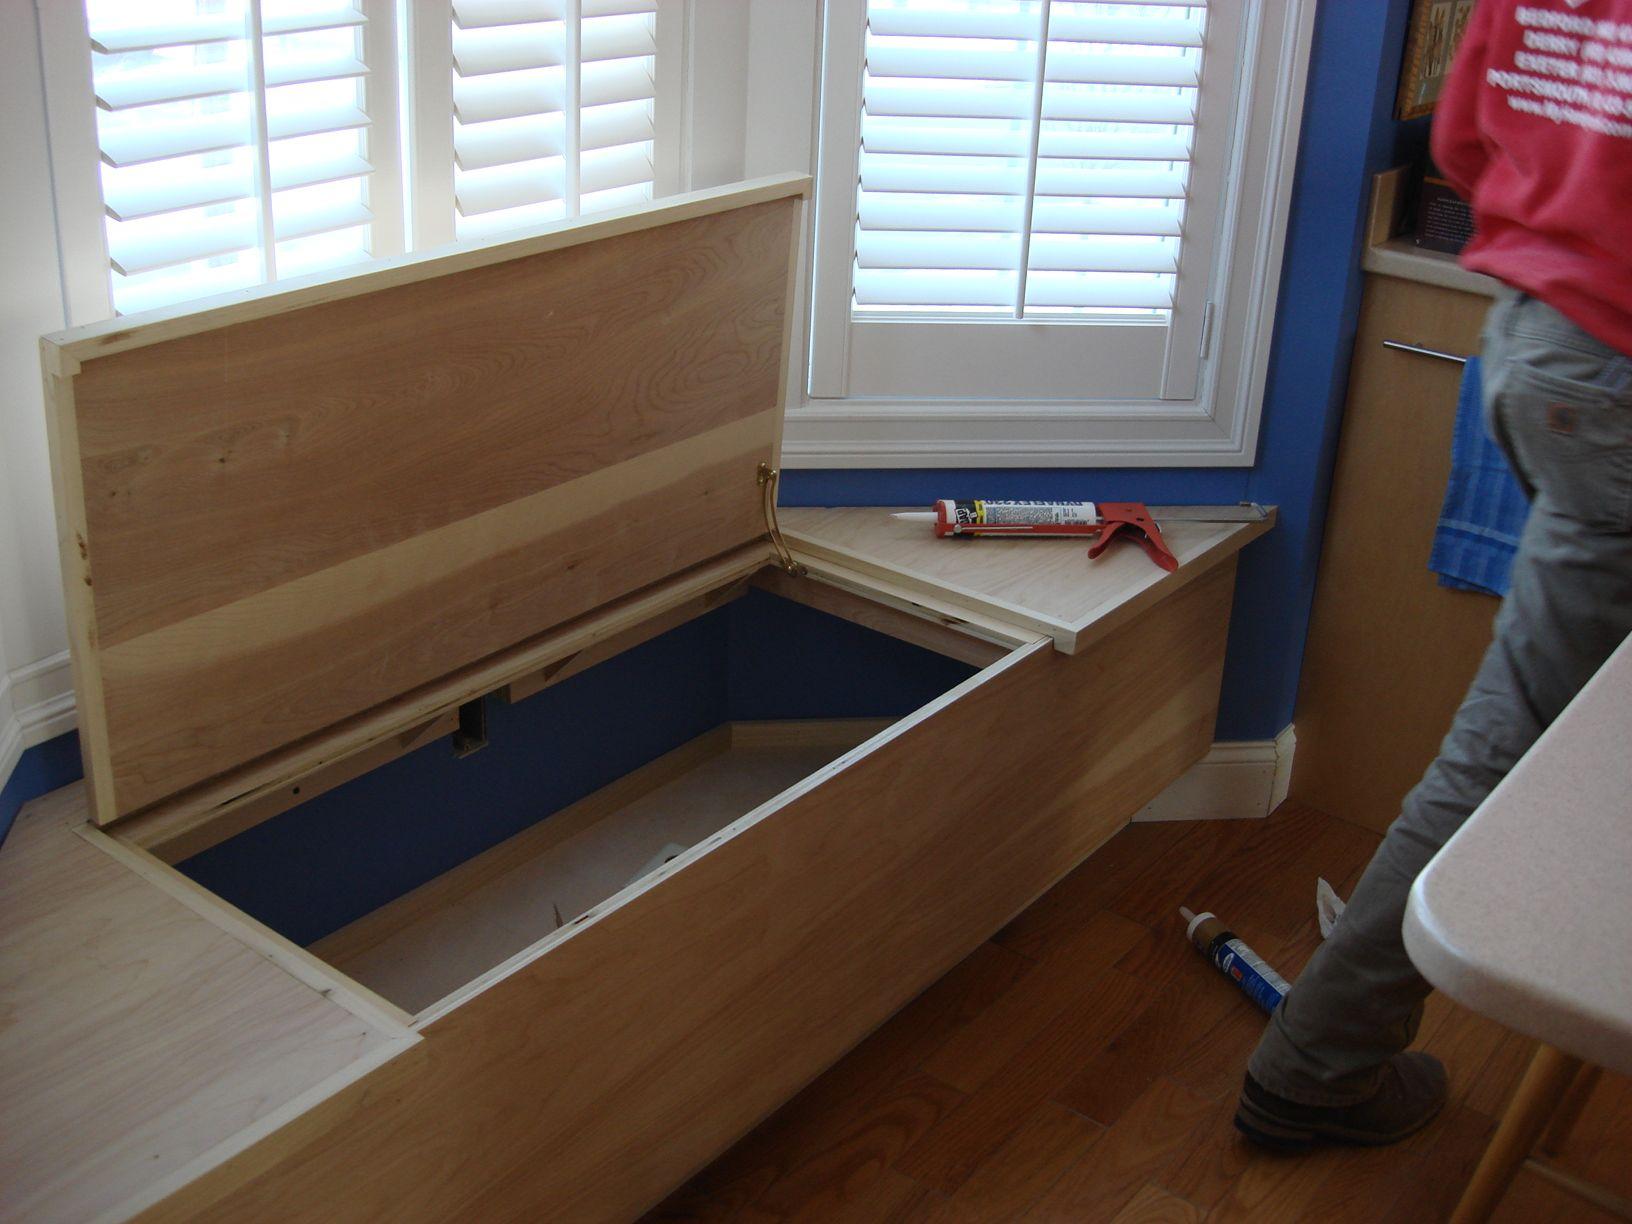 Solid Edges Toy Box That Opens Too Custom Window Seat Window Seat Diy Storage Bench